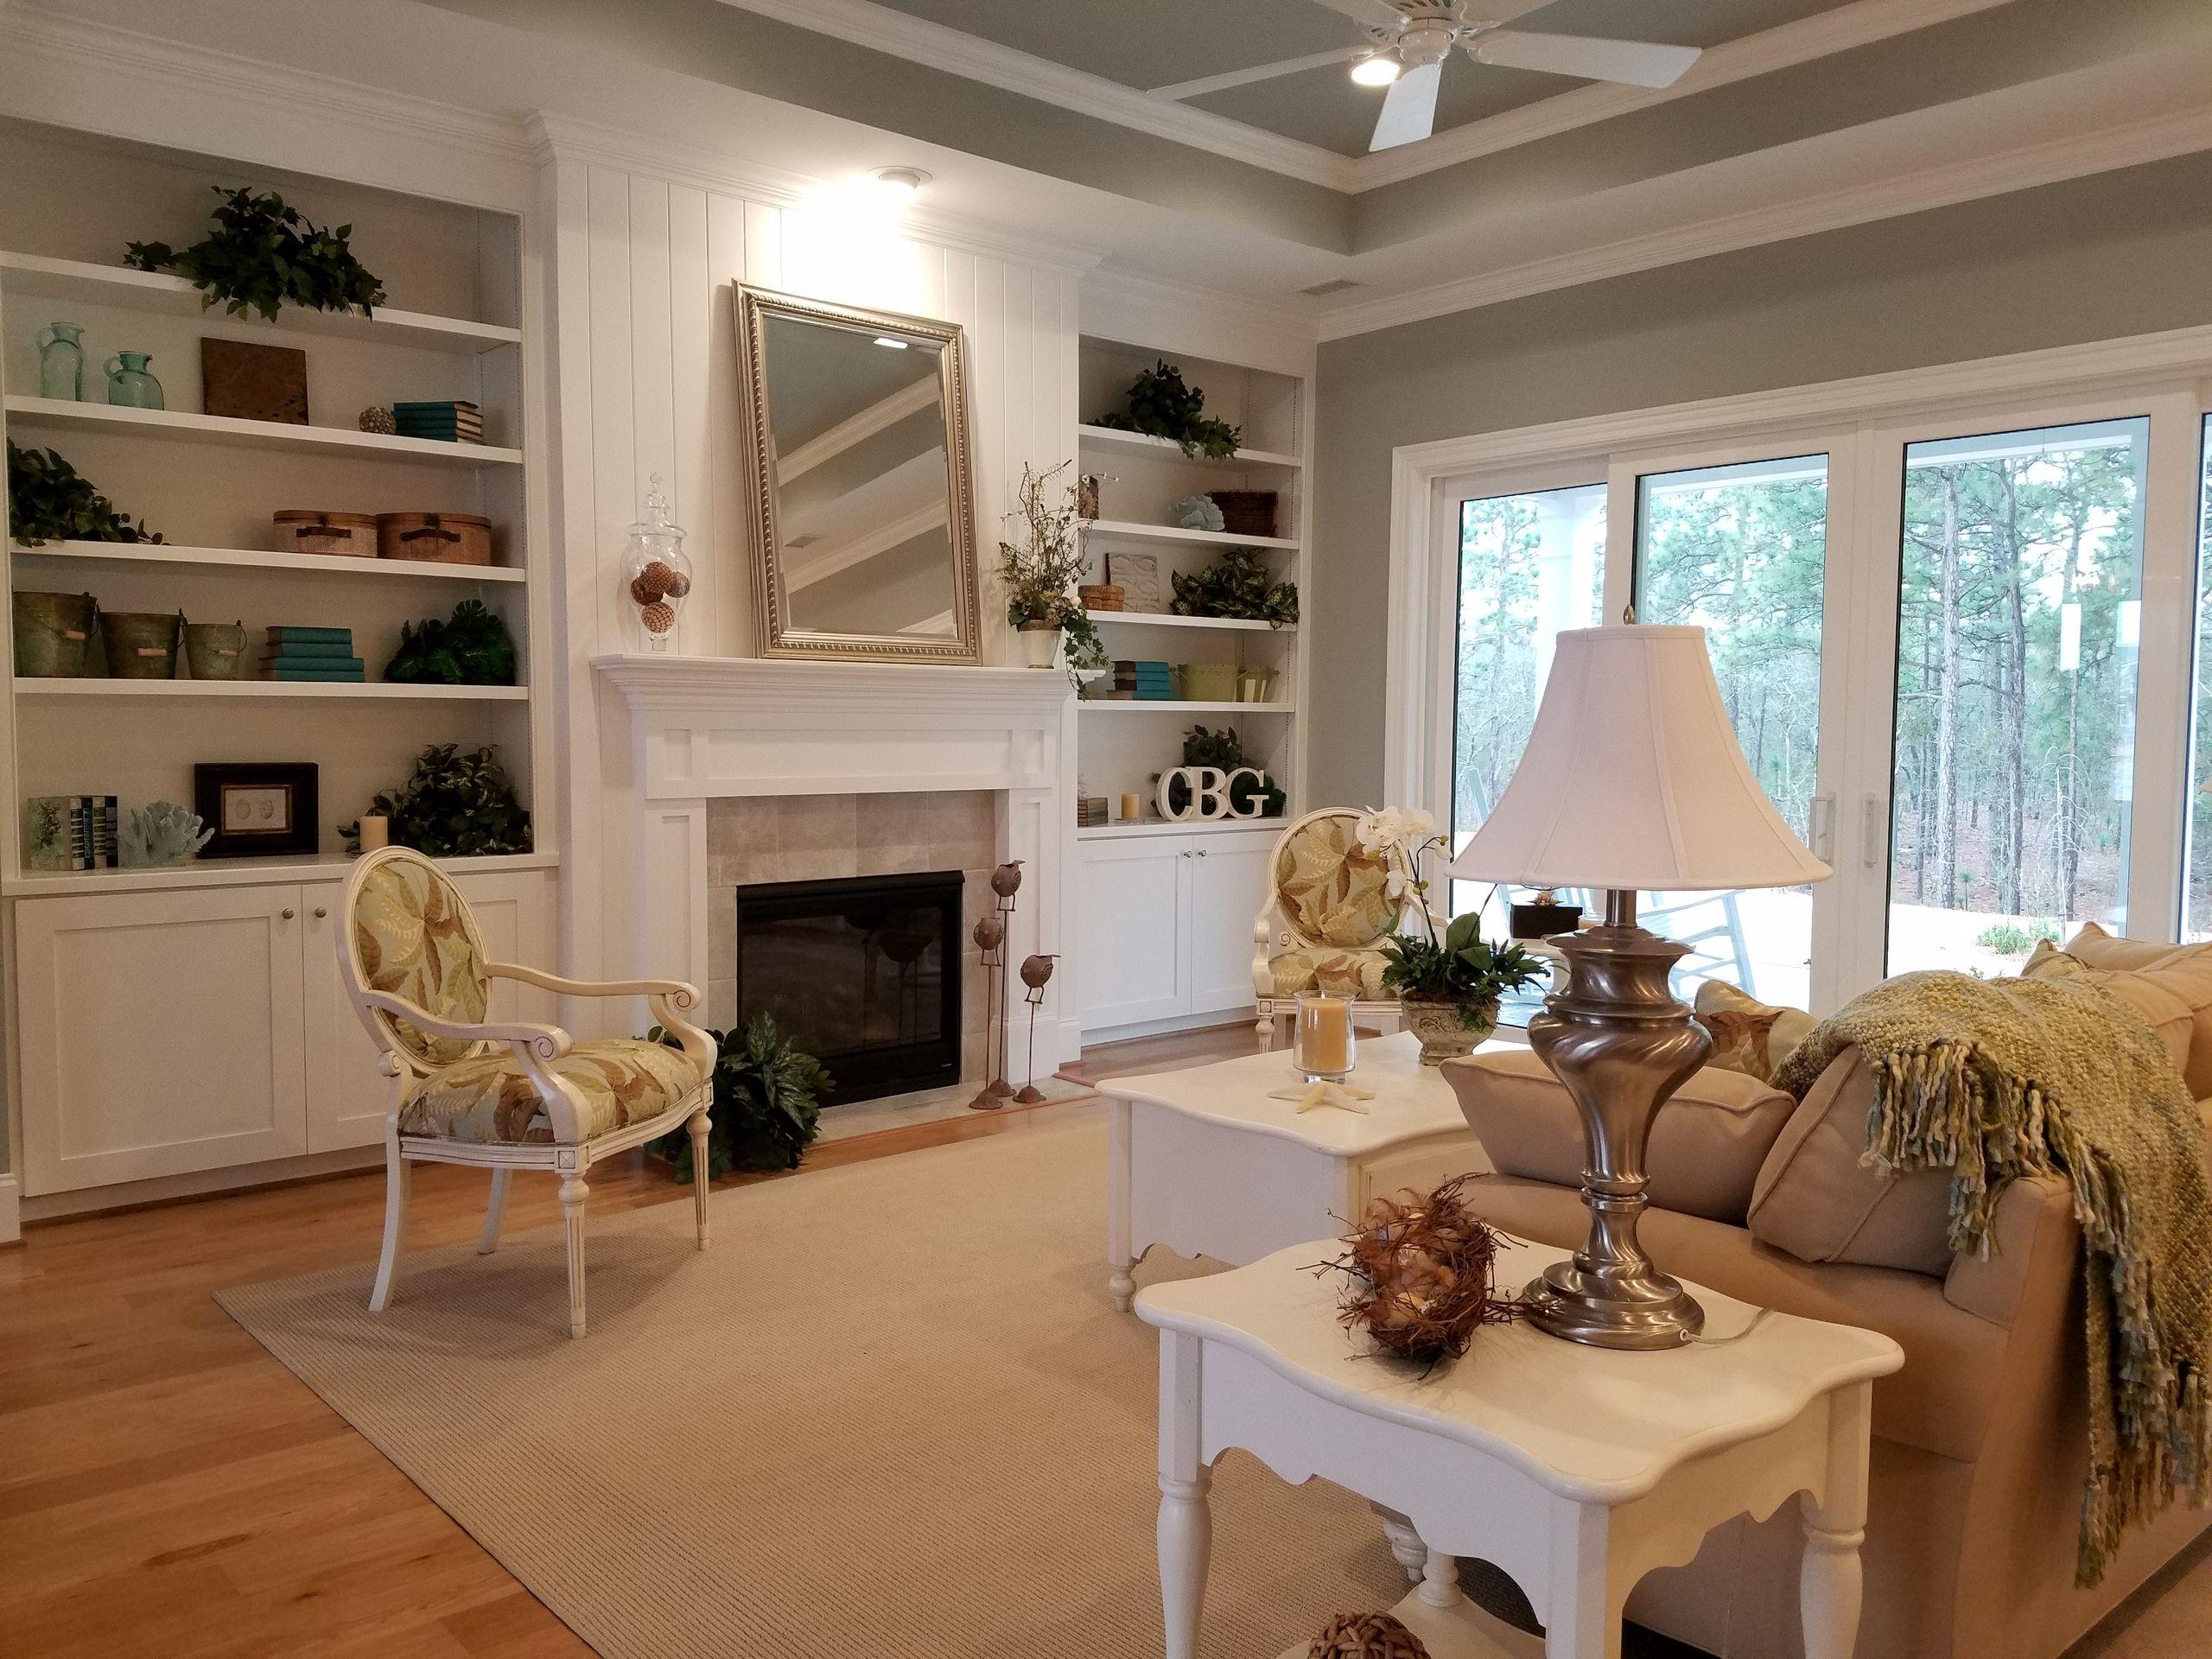 RiverLights - Charter Building Group Living Room